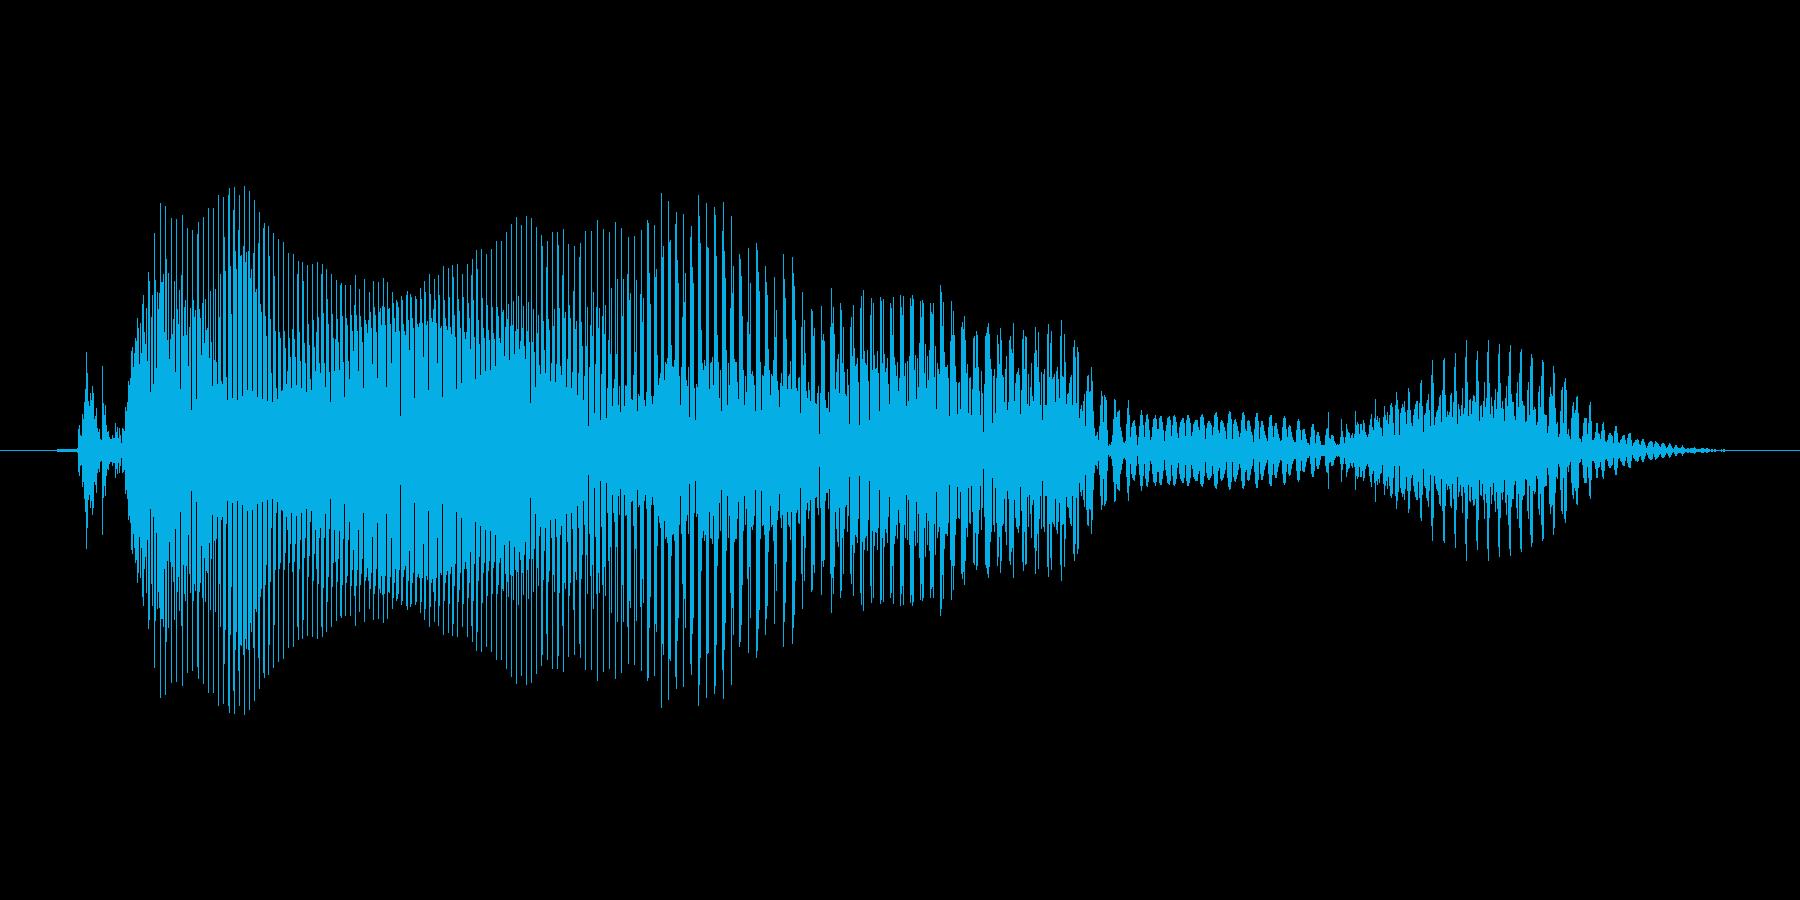 Good (意味:よい、よかった) 明…の再生済みの波形